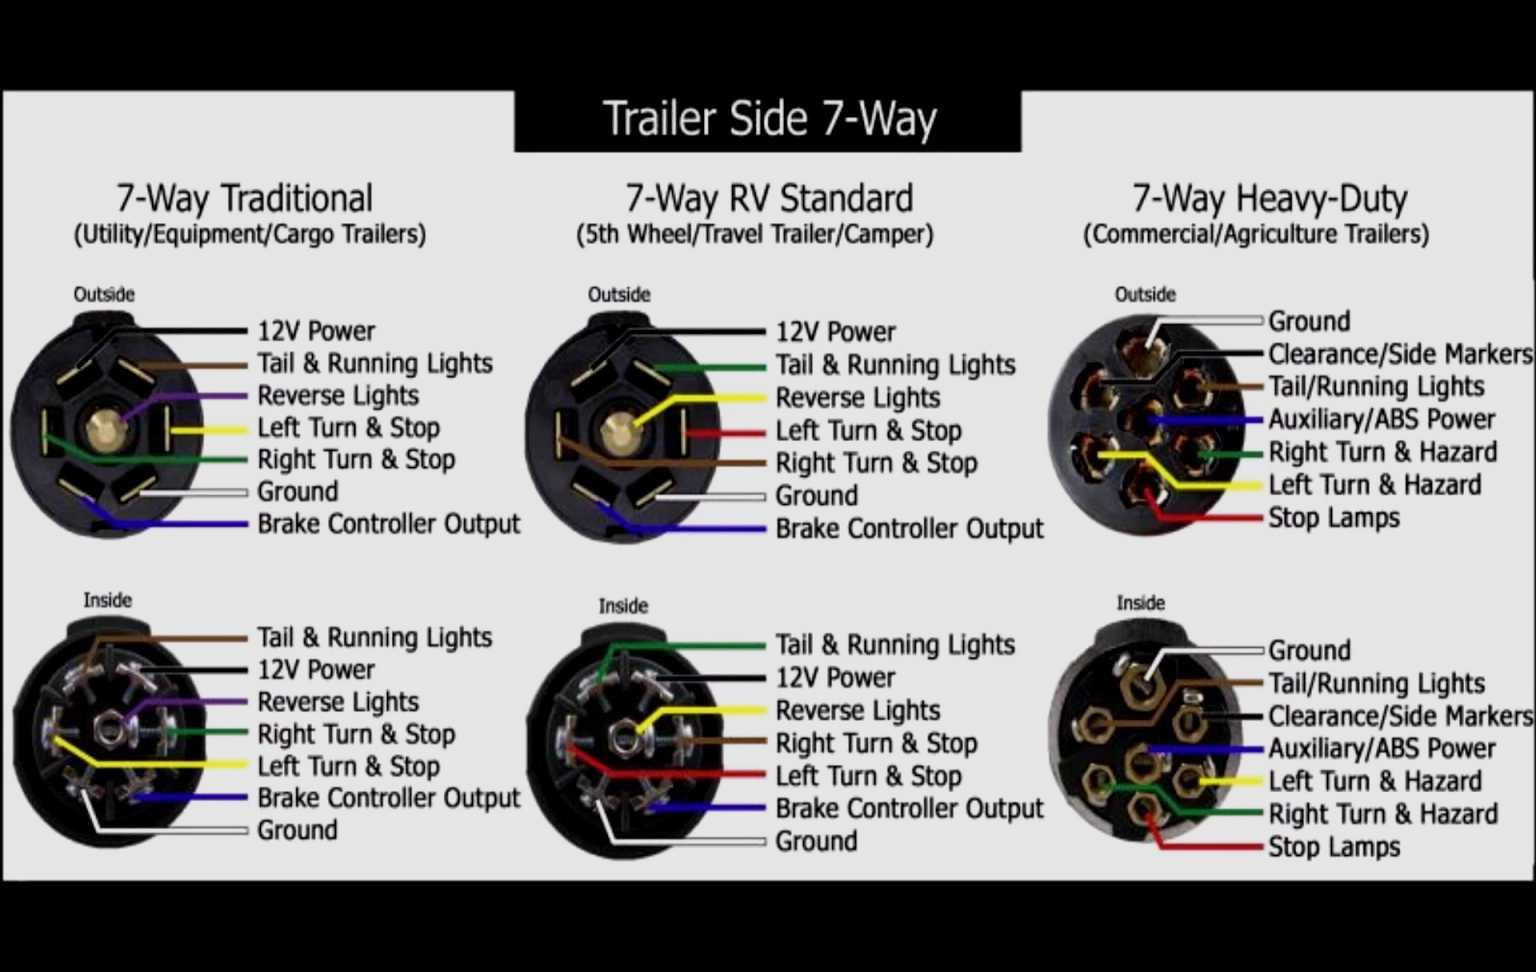 Diagram 7 Pin Trailer Connection Usa - Wiring Diagrams Hubs ... on 7 pin rv wiring, trailer plug diagram, 7 pronge trailer connector diagram, 7 pin trailer tools, 7 pin trailer connector, 7 pin trailer lighting, 7 wire diagram, 7 pin tow wiring, 7 pin trailer wire, 7 pin trailer brakes, 4 pin trailer diagram,